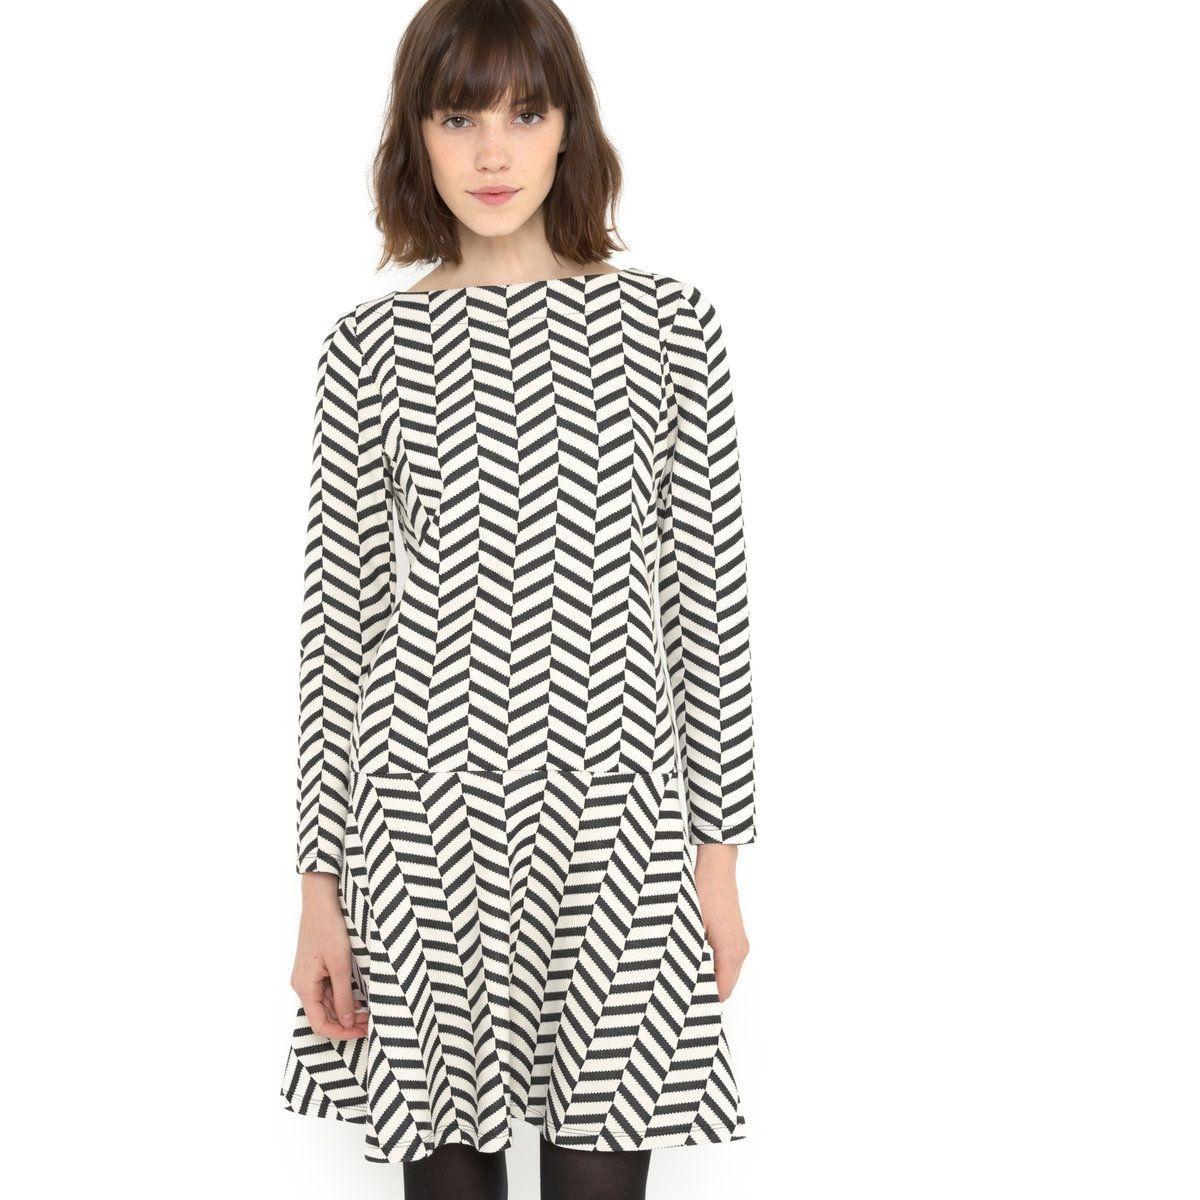 Robe jacquard noir et blanc